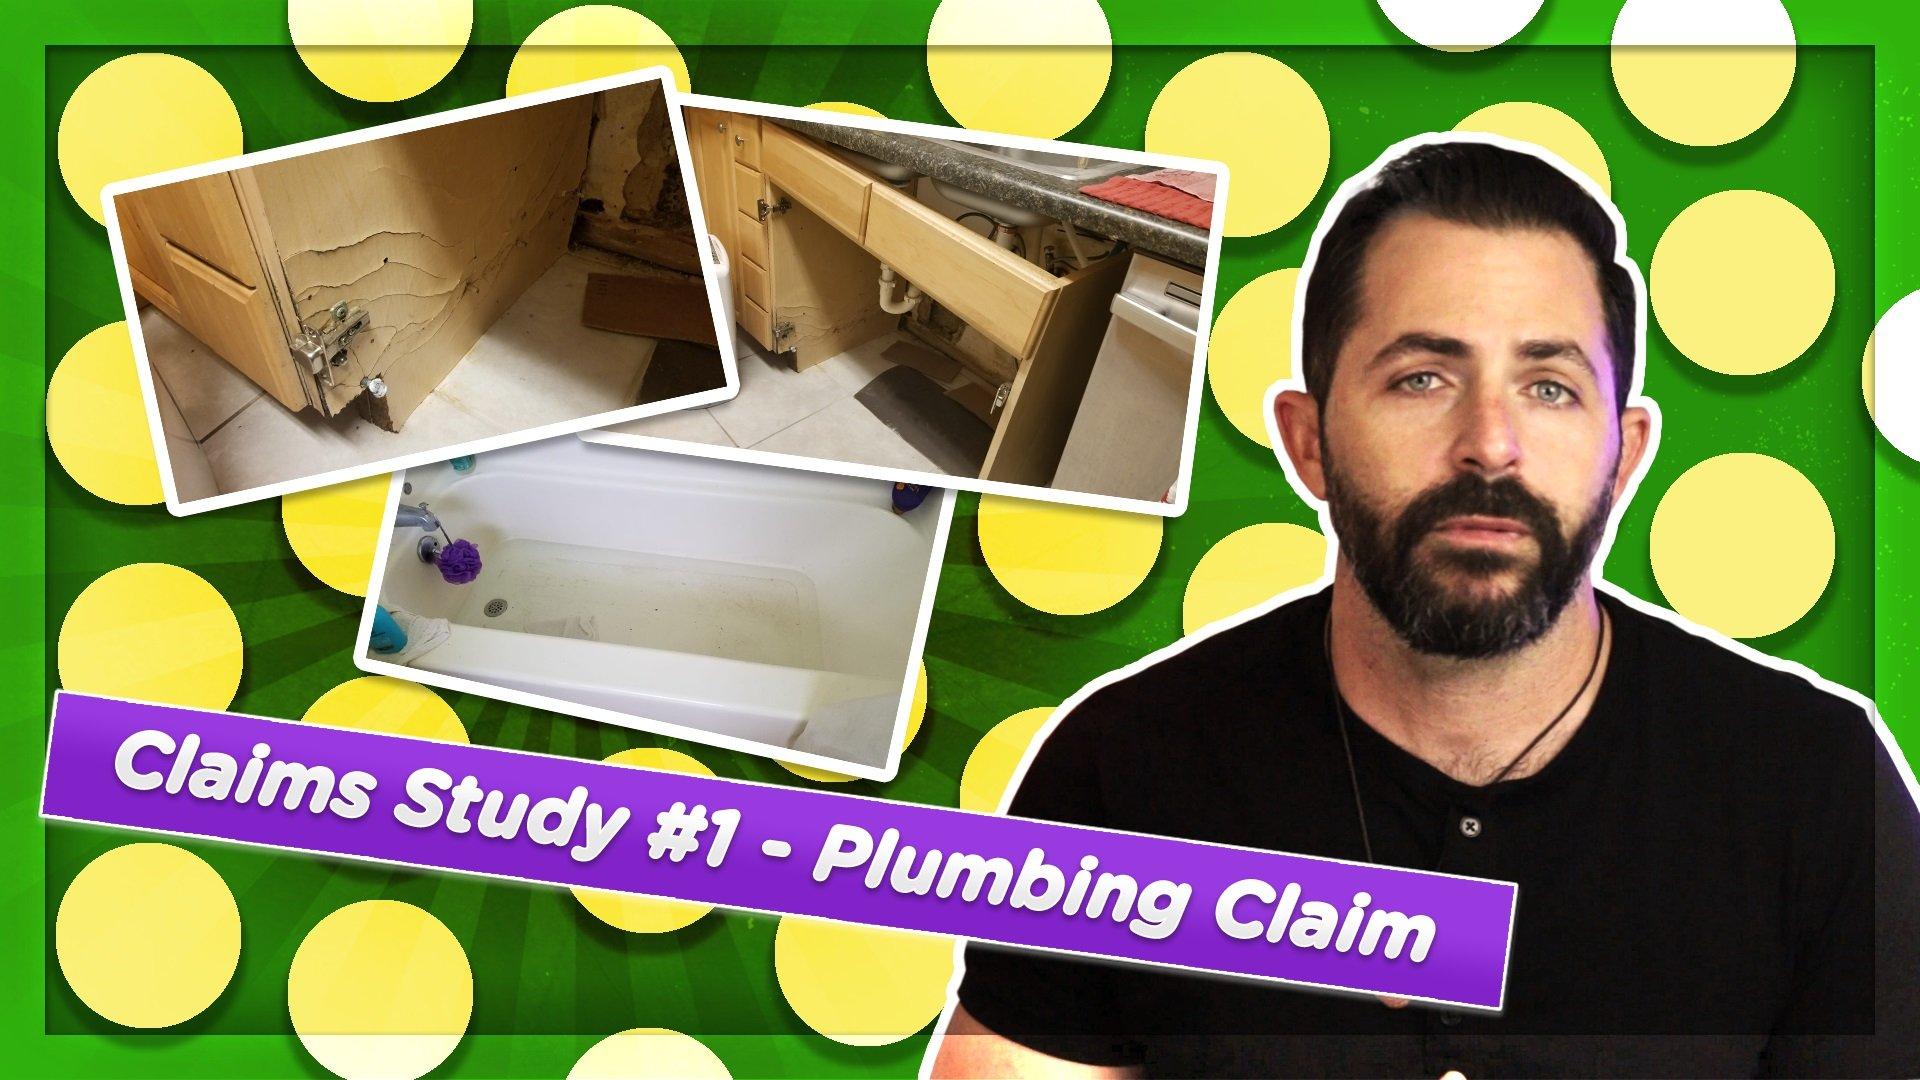 plumbing claim